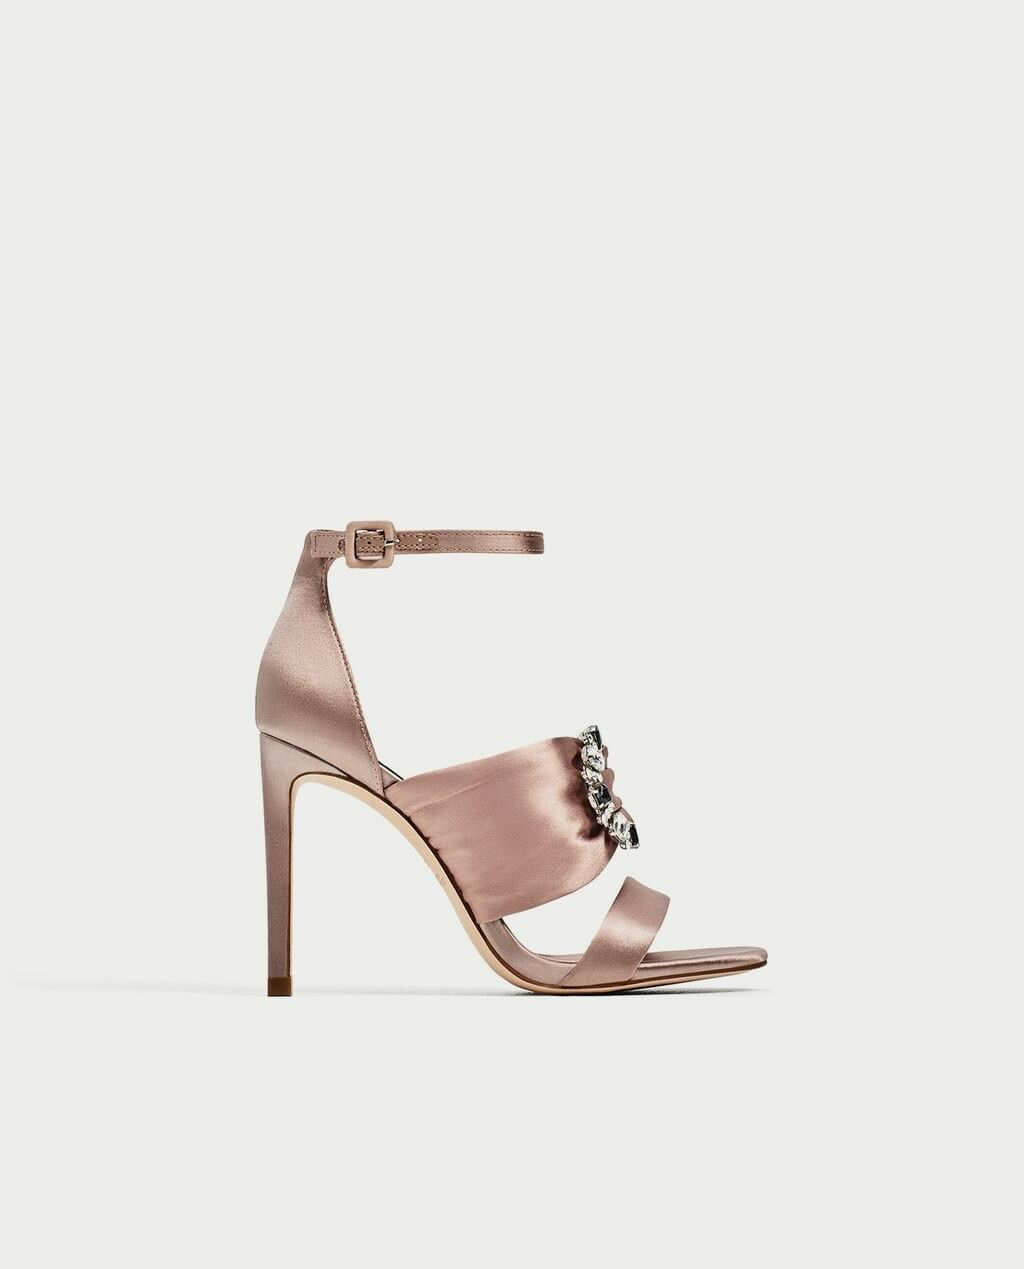 Zara SS17 Woman Satin High Heel Sandaleen Nude Größe 7.5 EUR 38 NWT